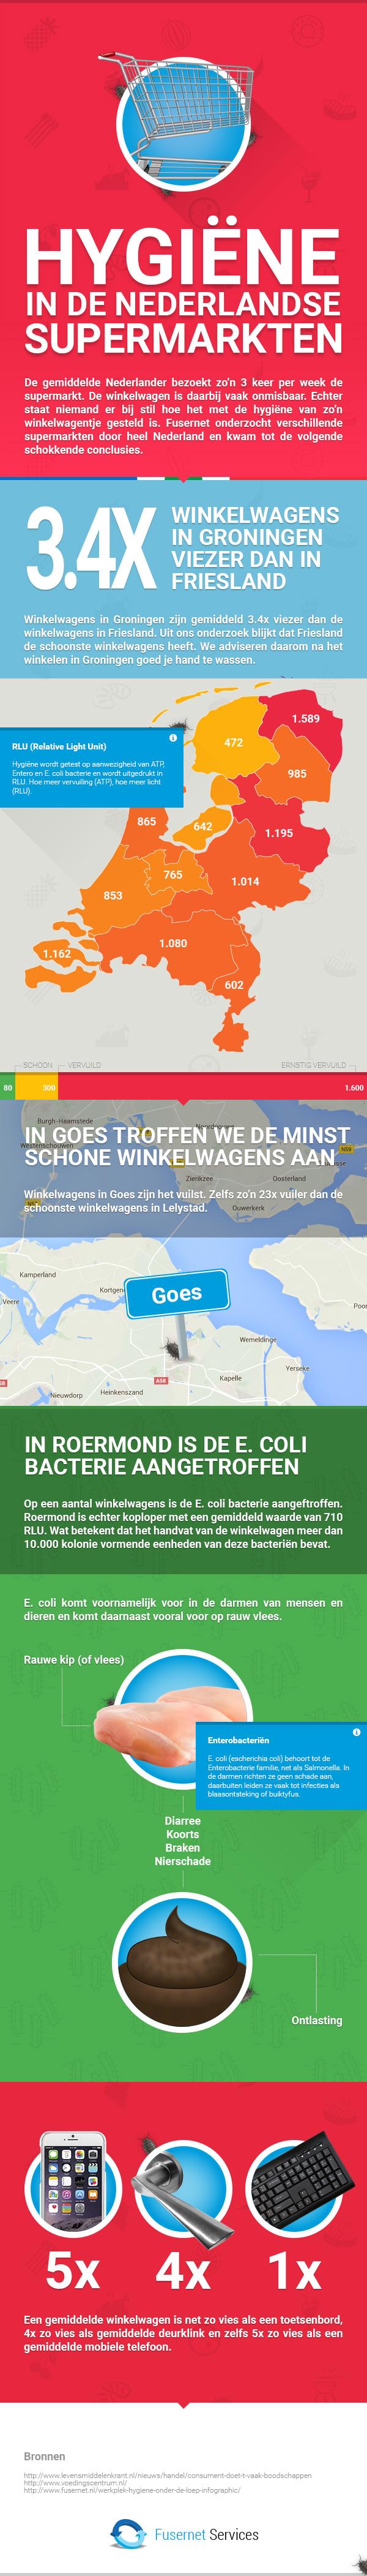 [infographic] Fusernet ICT Services - Hygiene in de Nederlandse supermarkten